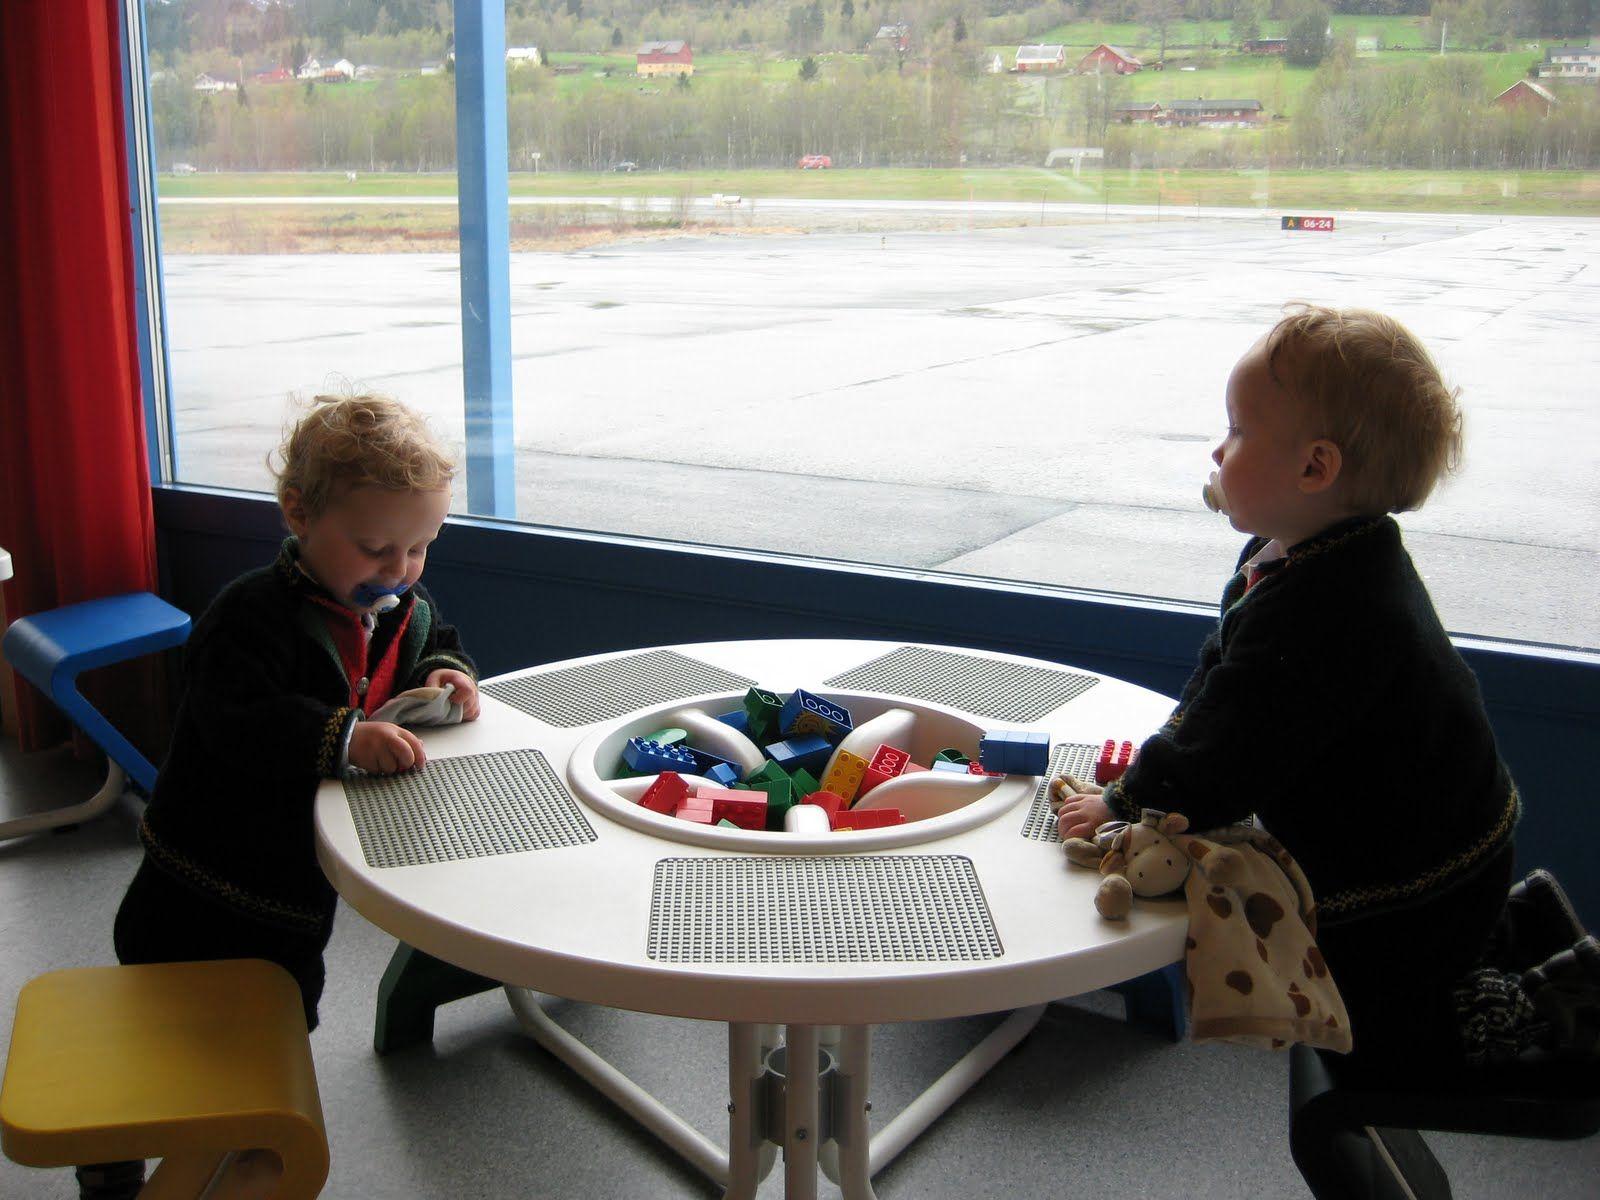 Round Lego Table